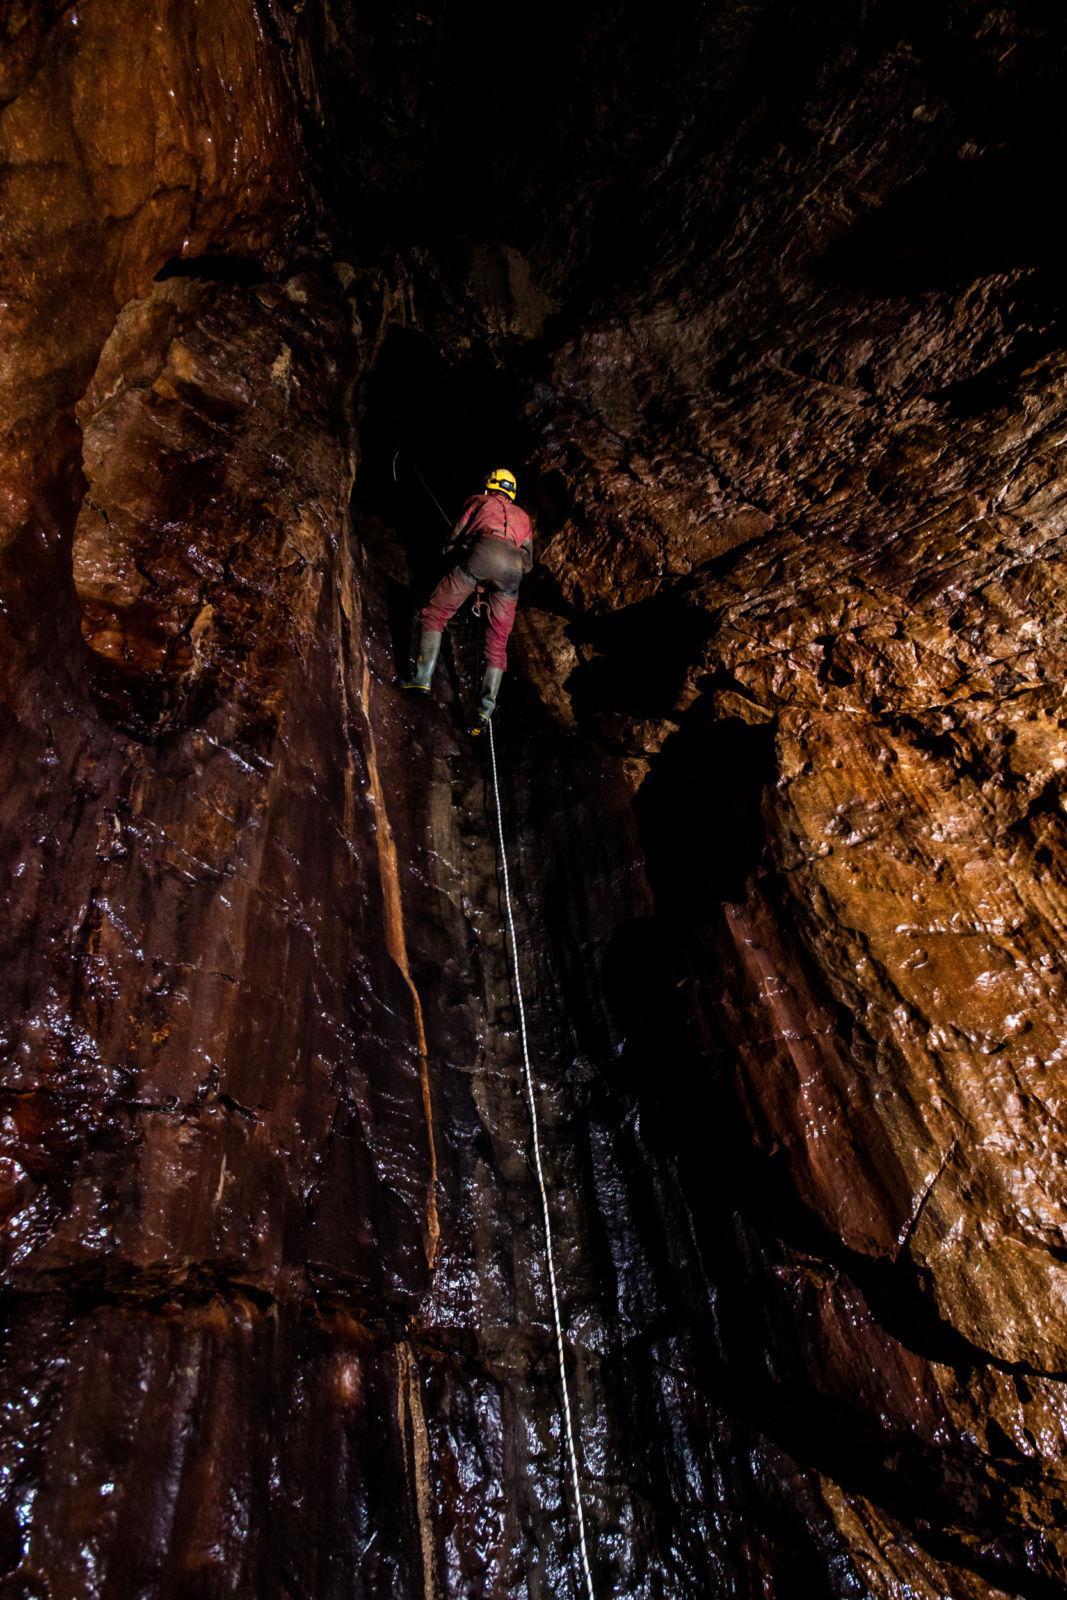 Cyril na vrvi v Ocizeljski jami